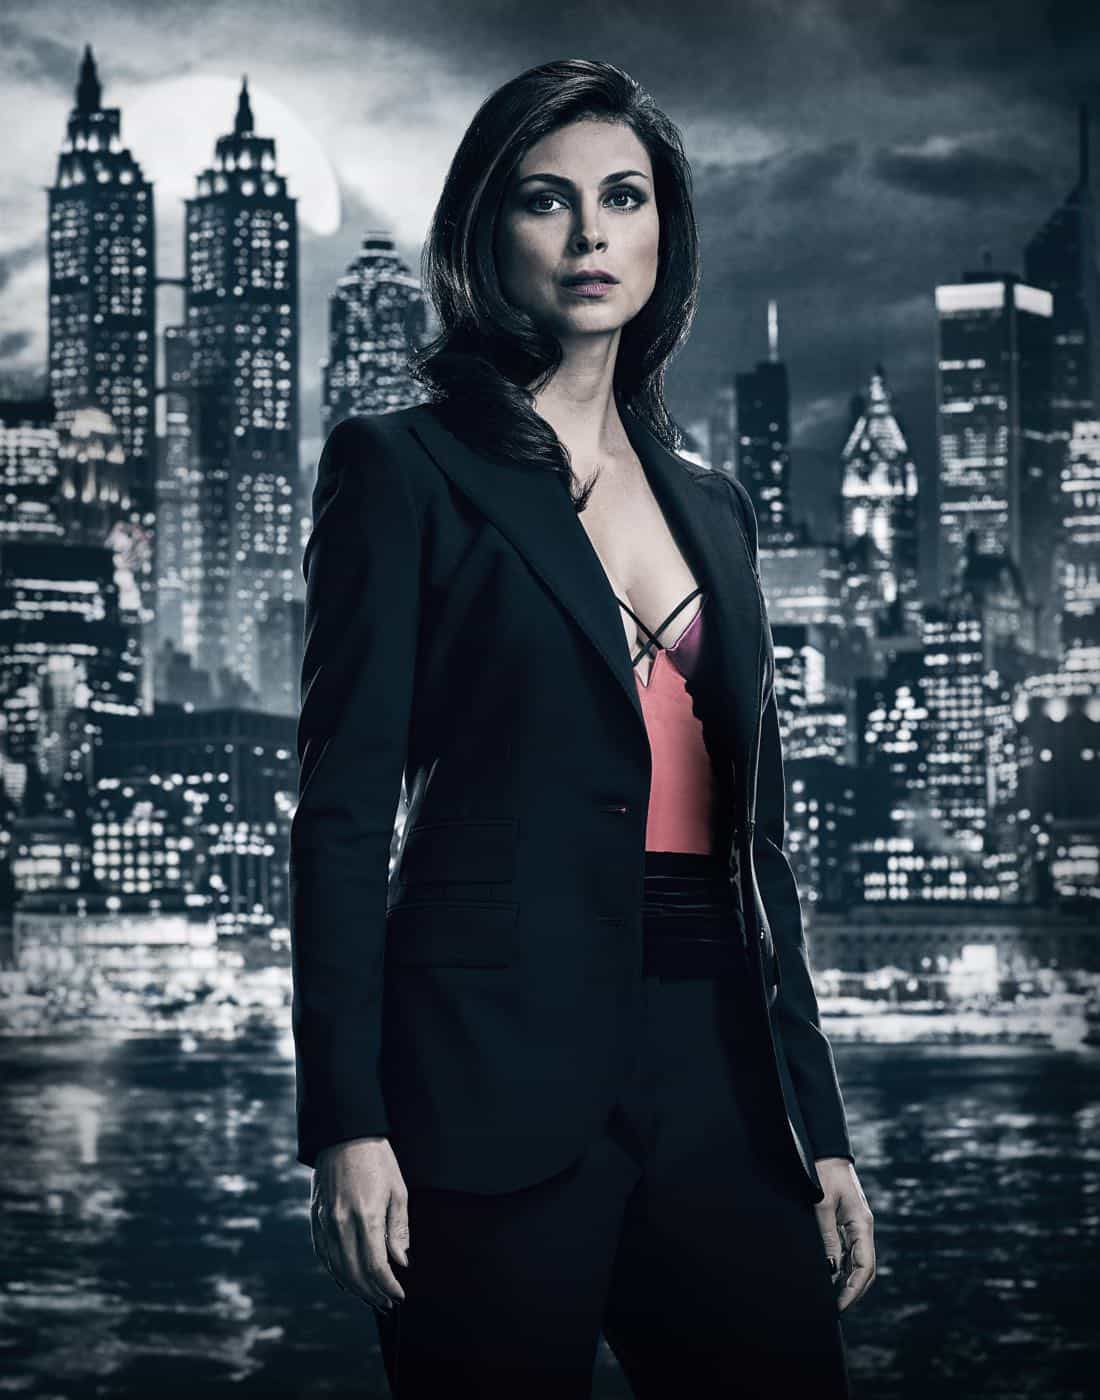 Morena Baccarin. Season 4 of GOTHAM